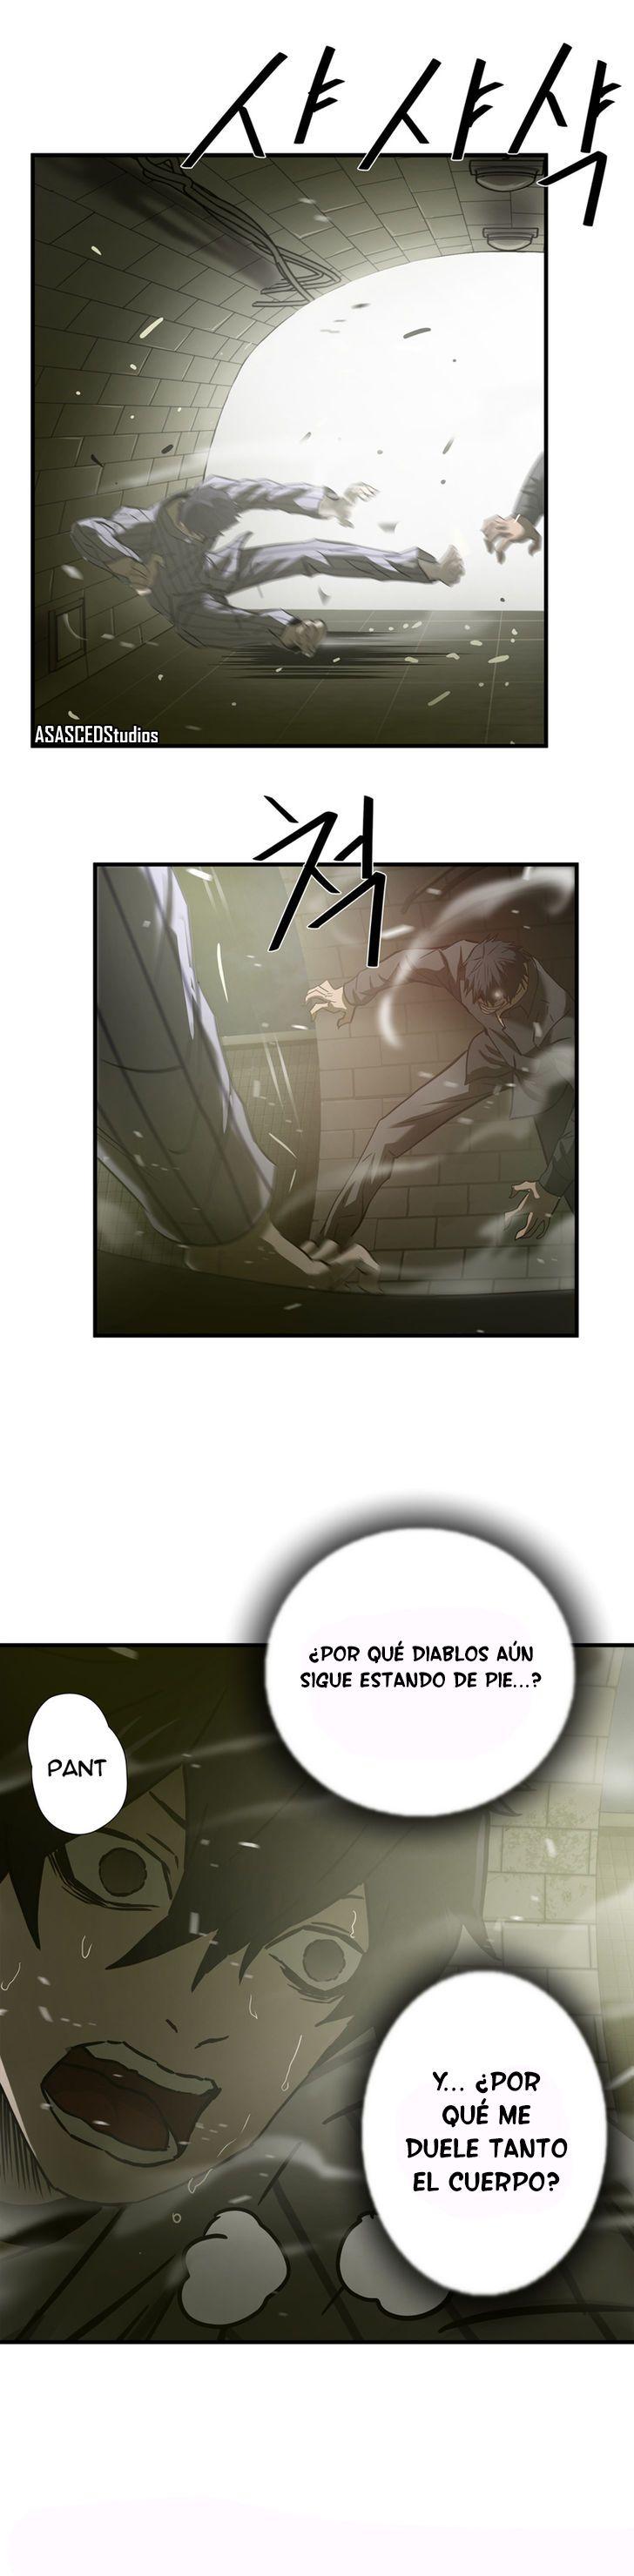 https://c5.ninemanga.com/es_manga/pic2/58/19386/514965/366425700da51f66b270d6ad114e1f09.jpg Page 6